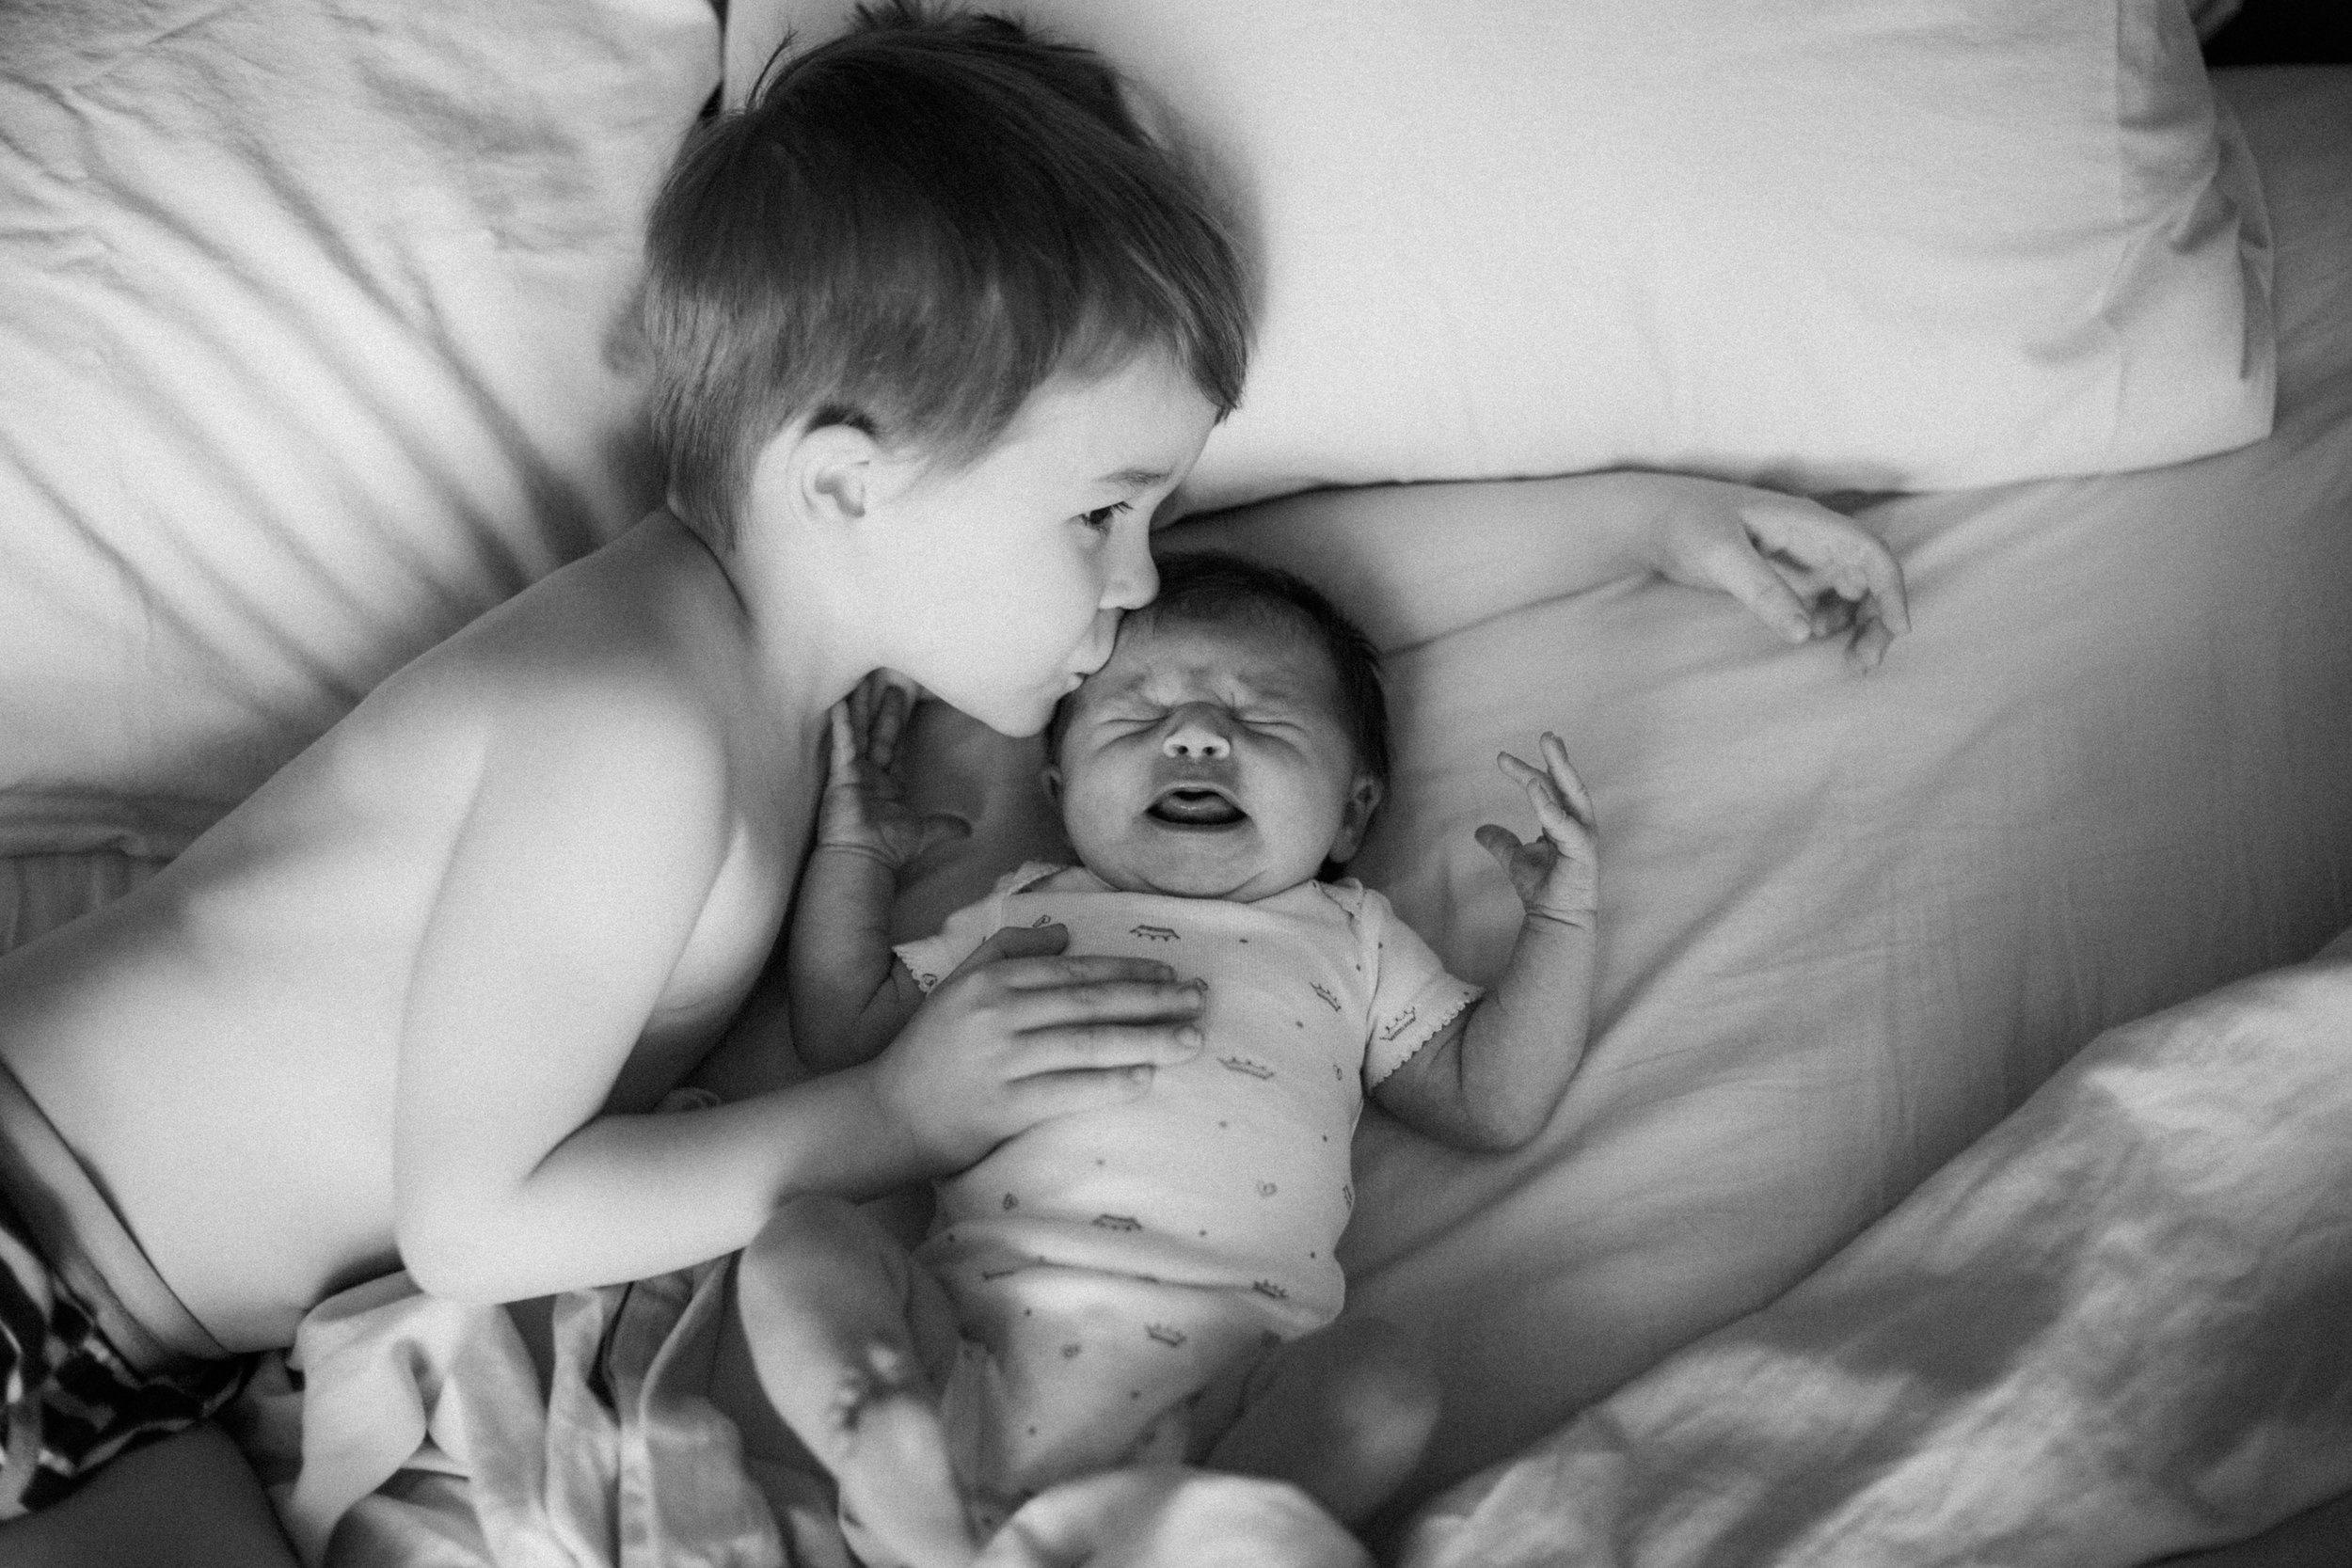 In home lifestyle family photography by Britt DeZeeuw, Brainerd Minnesota photographer